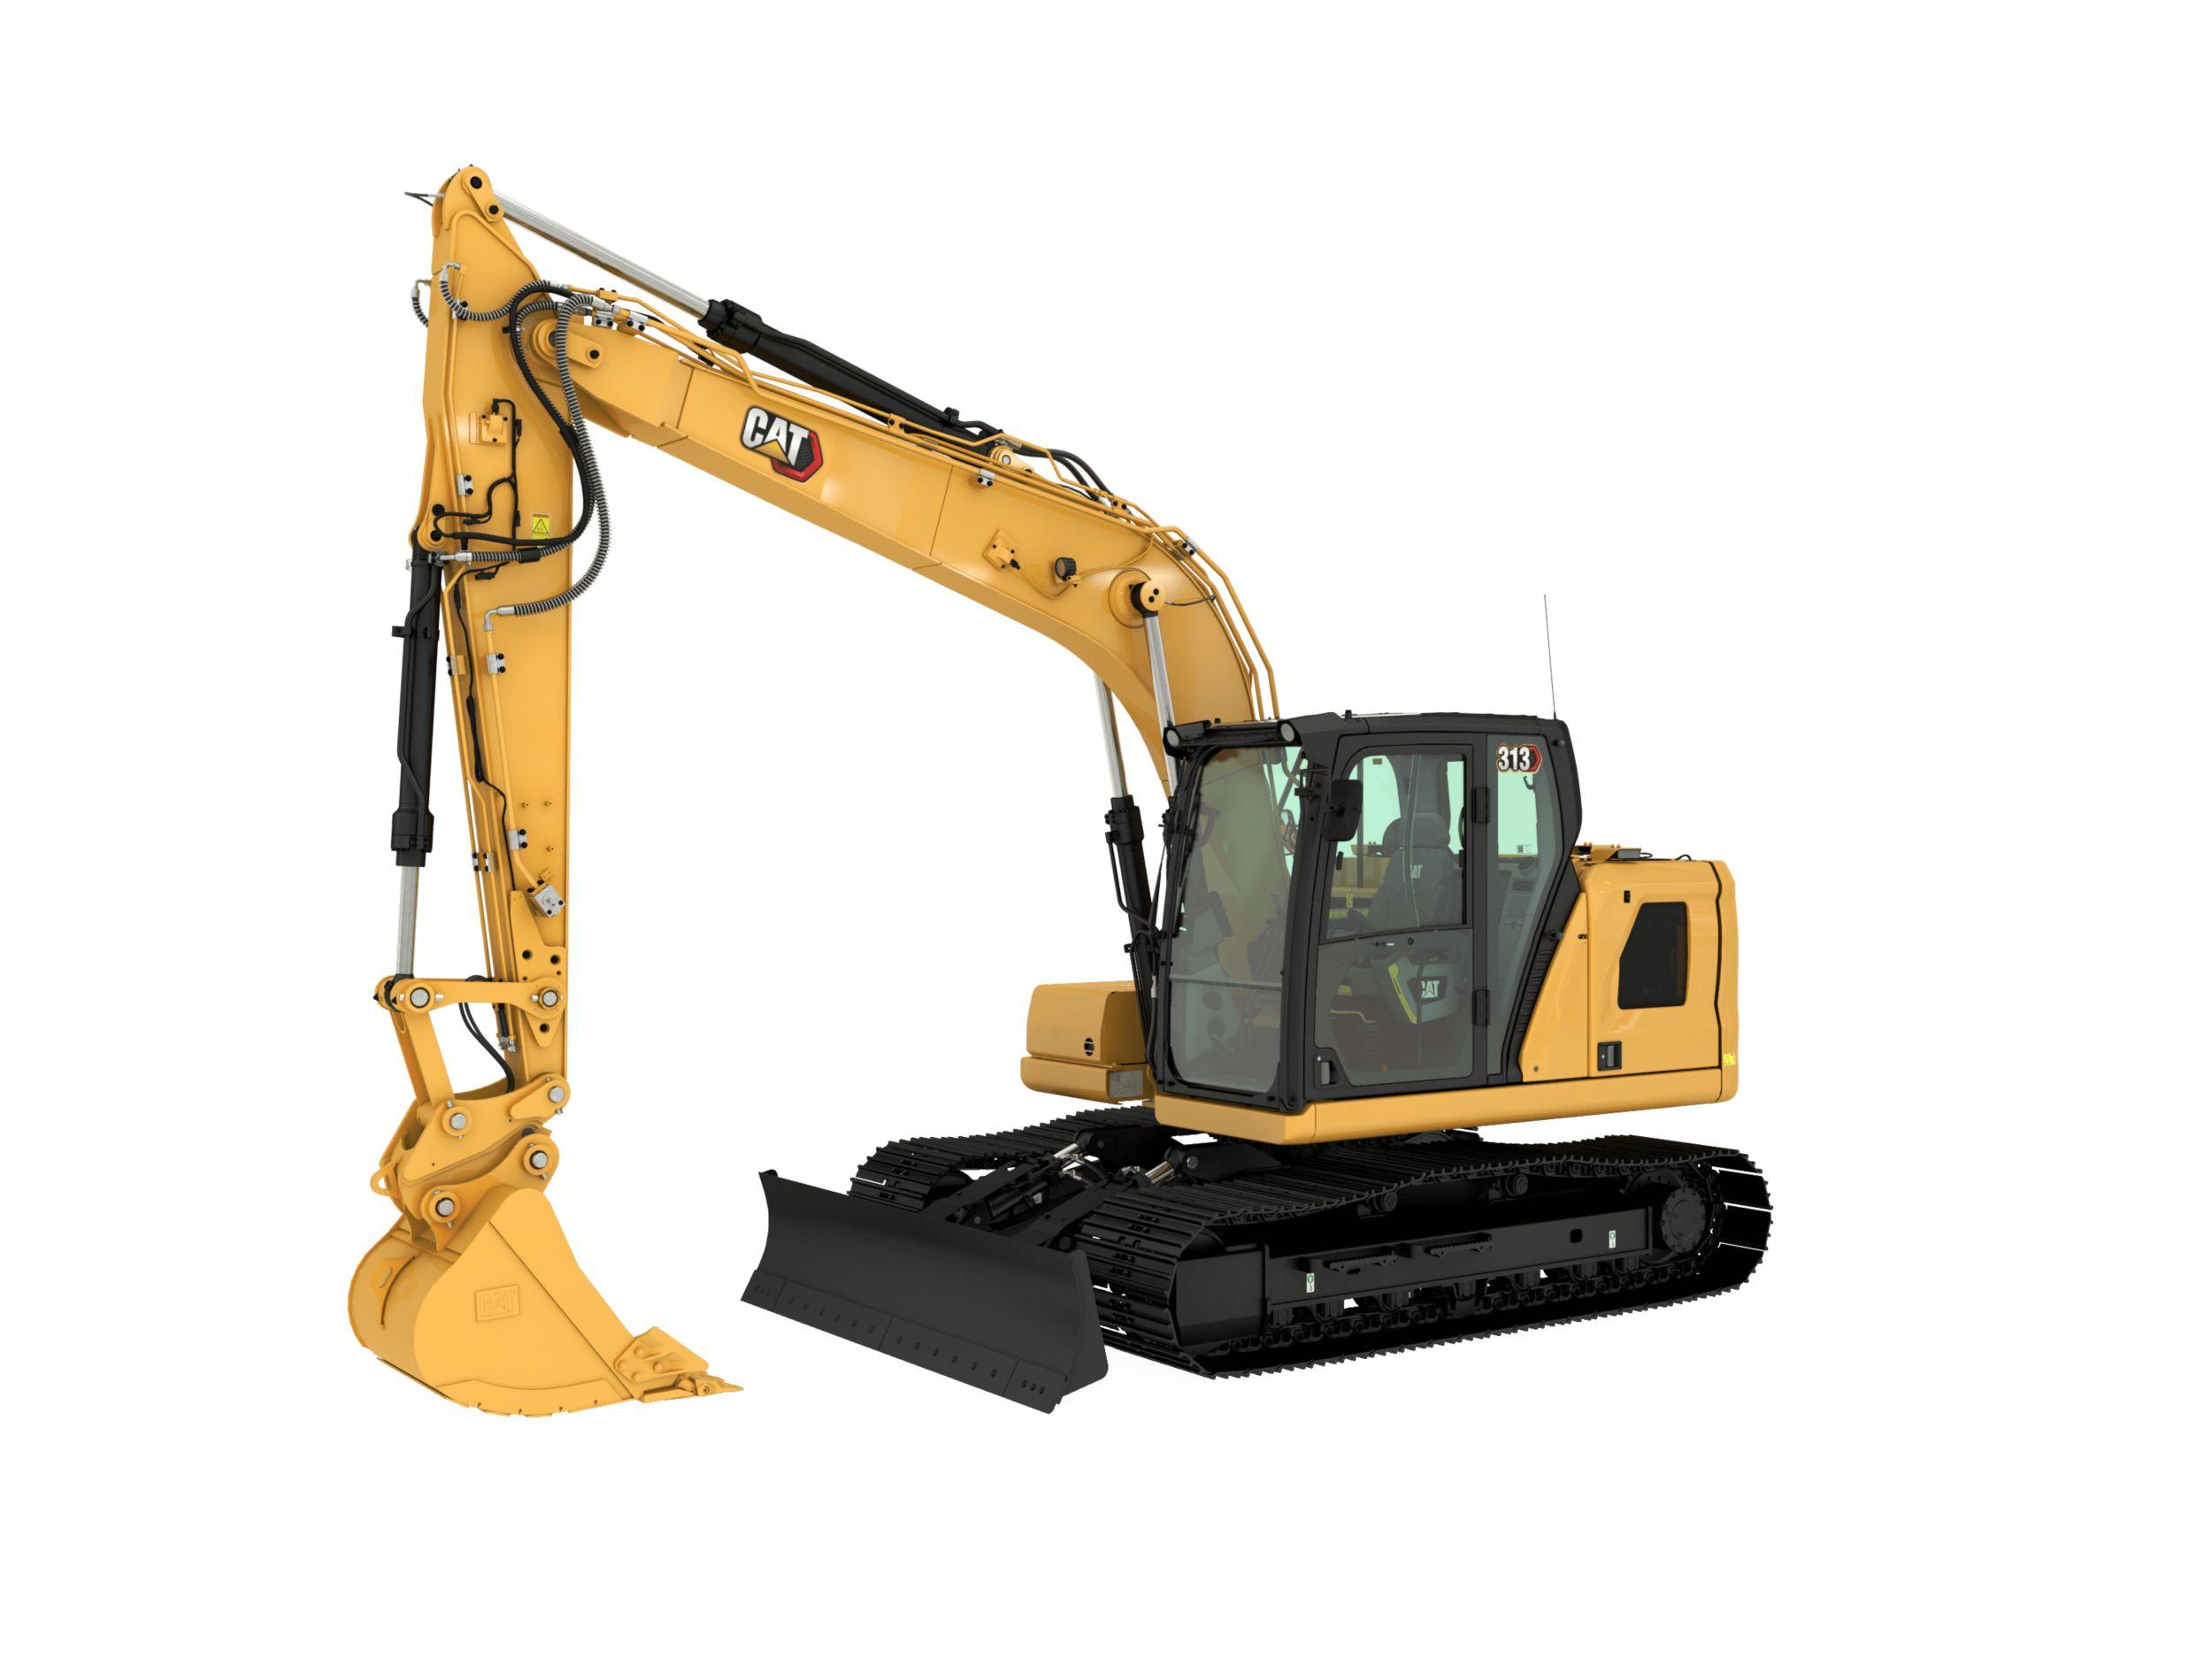 313 Hydraulic Excavator